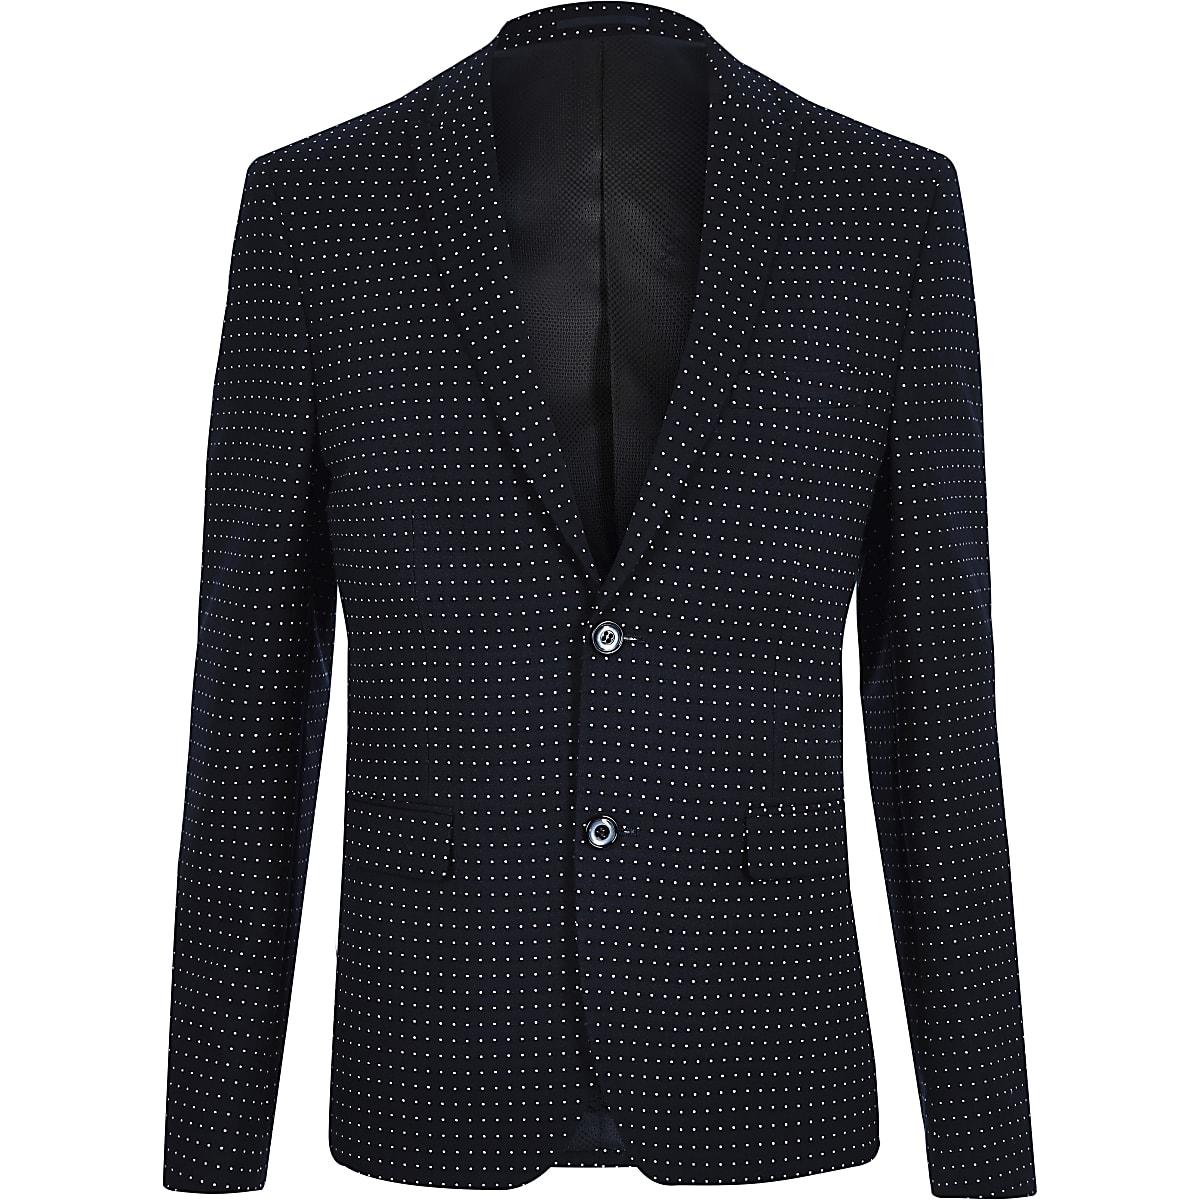 Navy polka dot skinny fit suit jacket